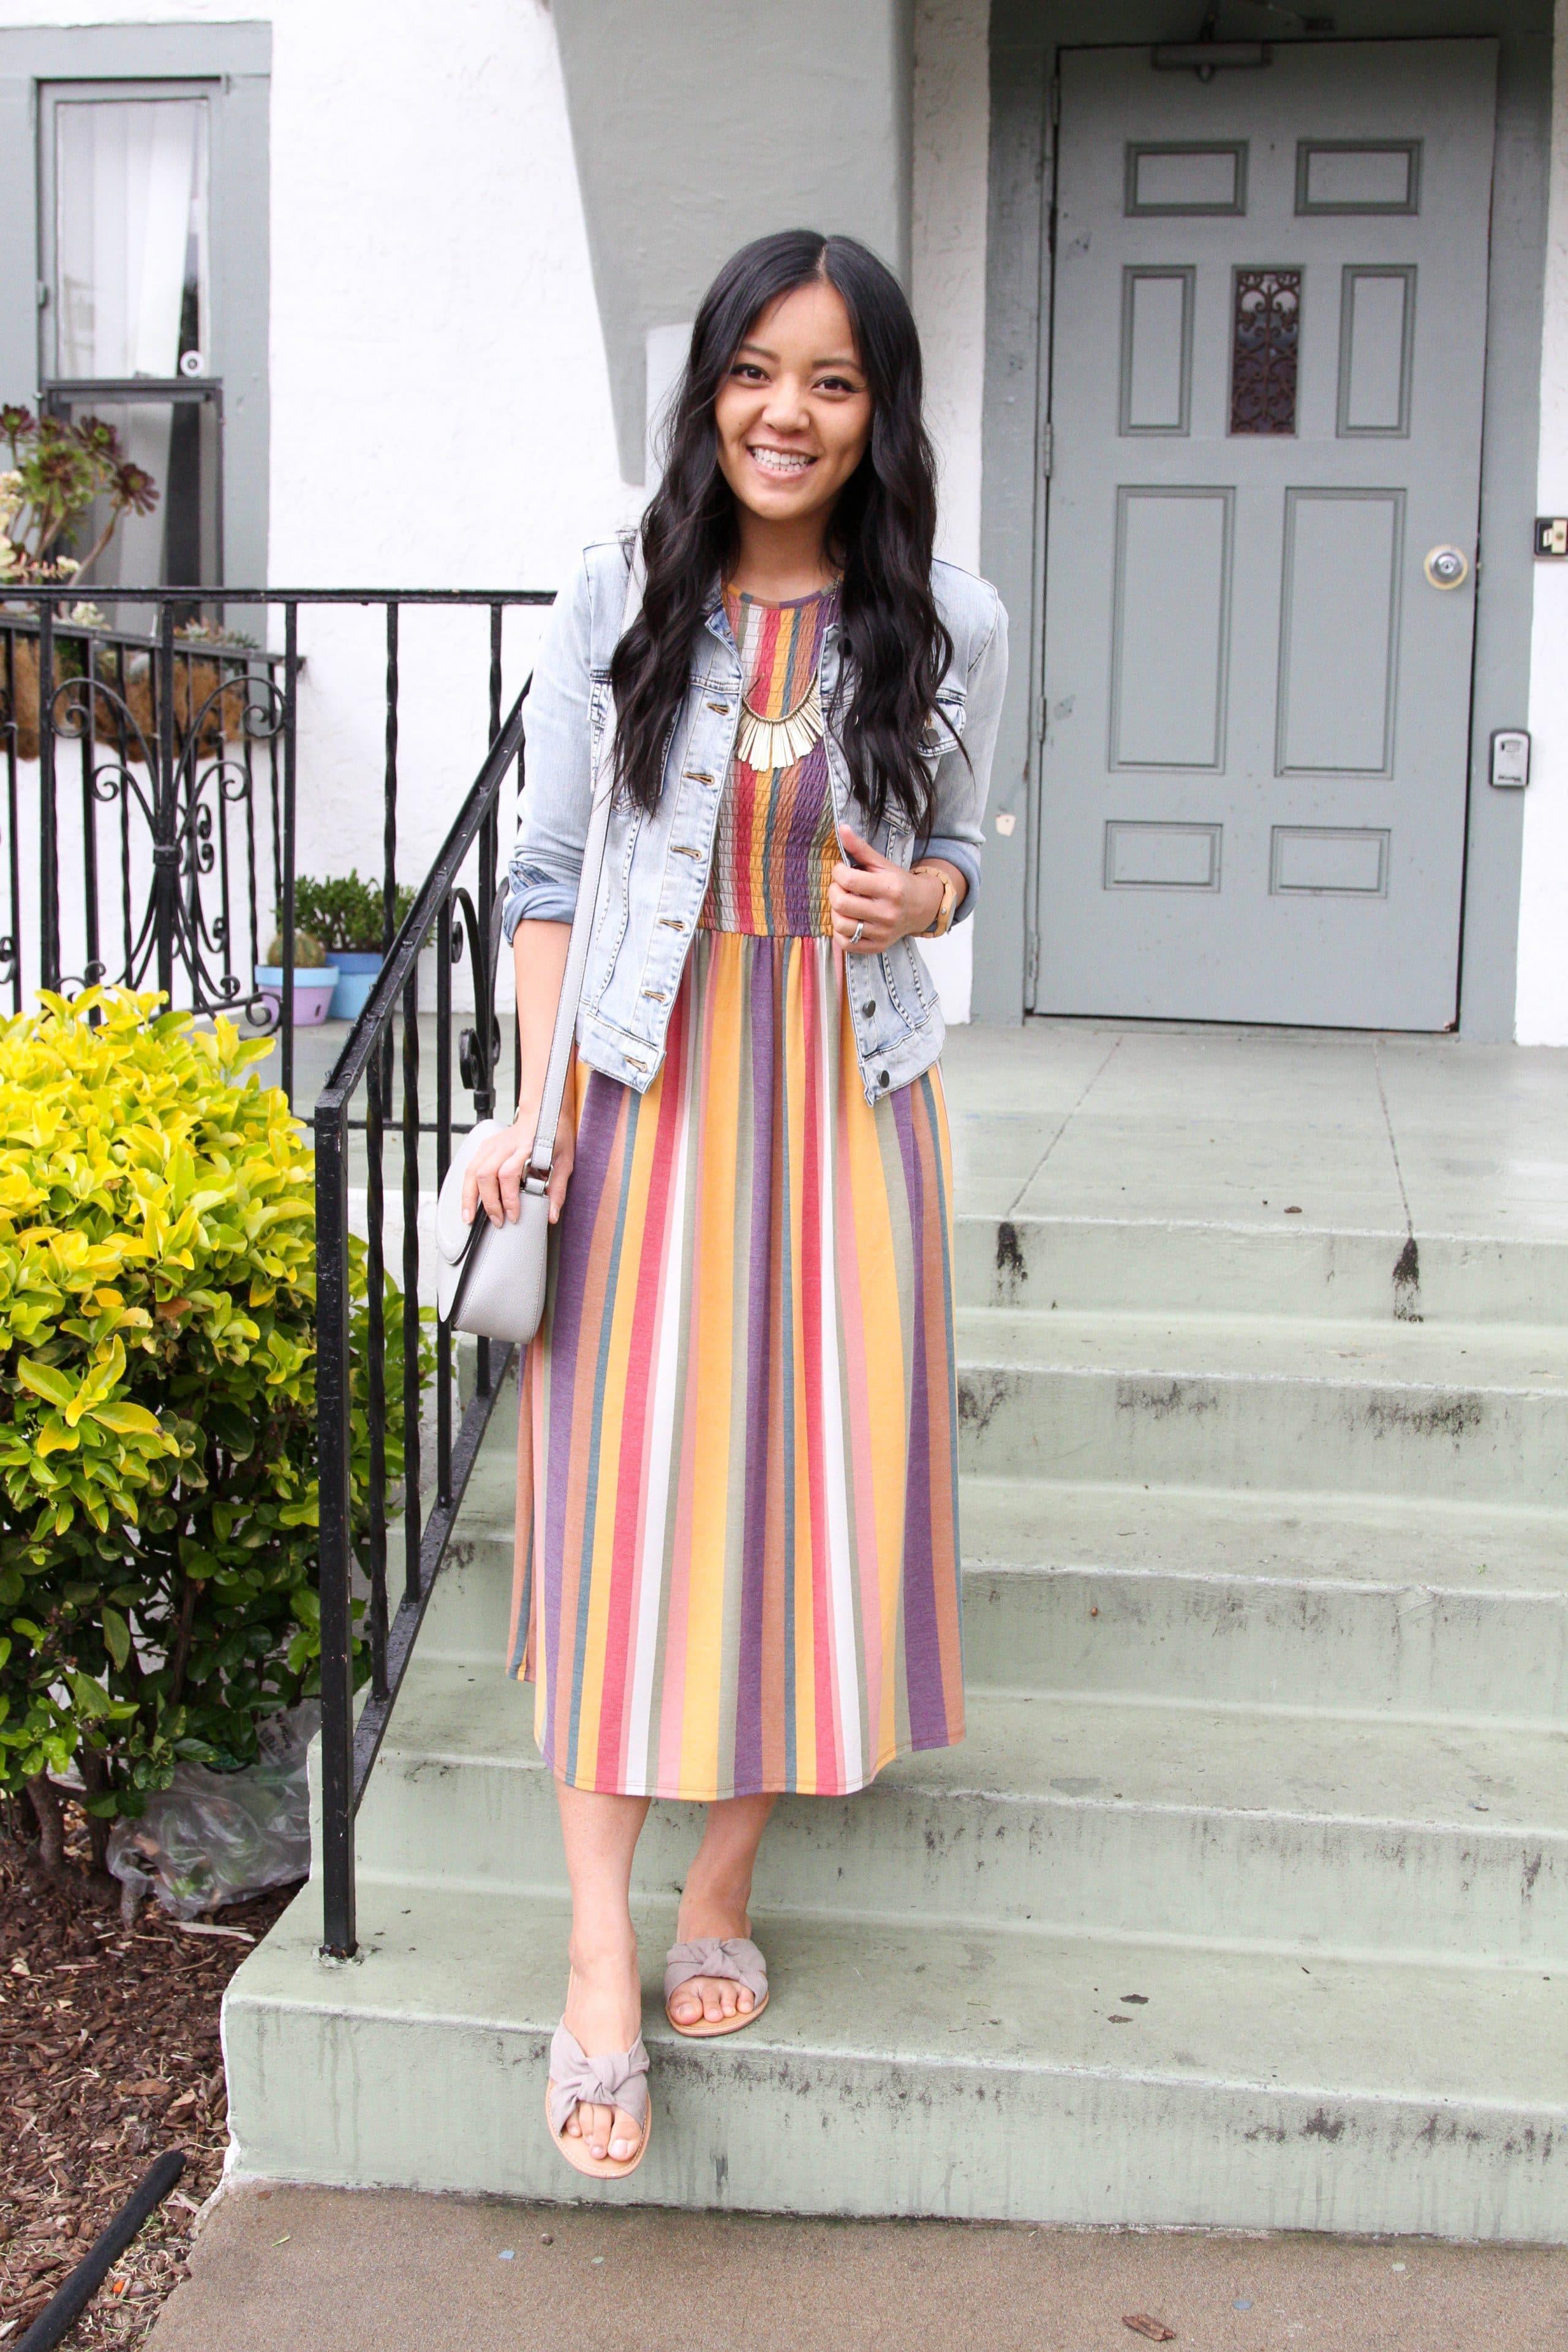 striped maxi dress + denim jacket + grey purse + sandals + statement necklace